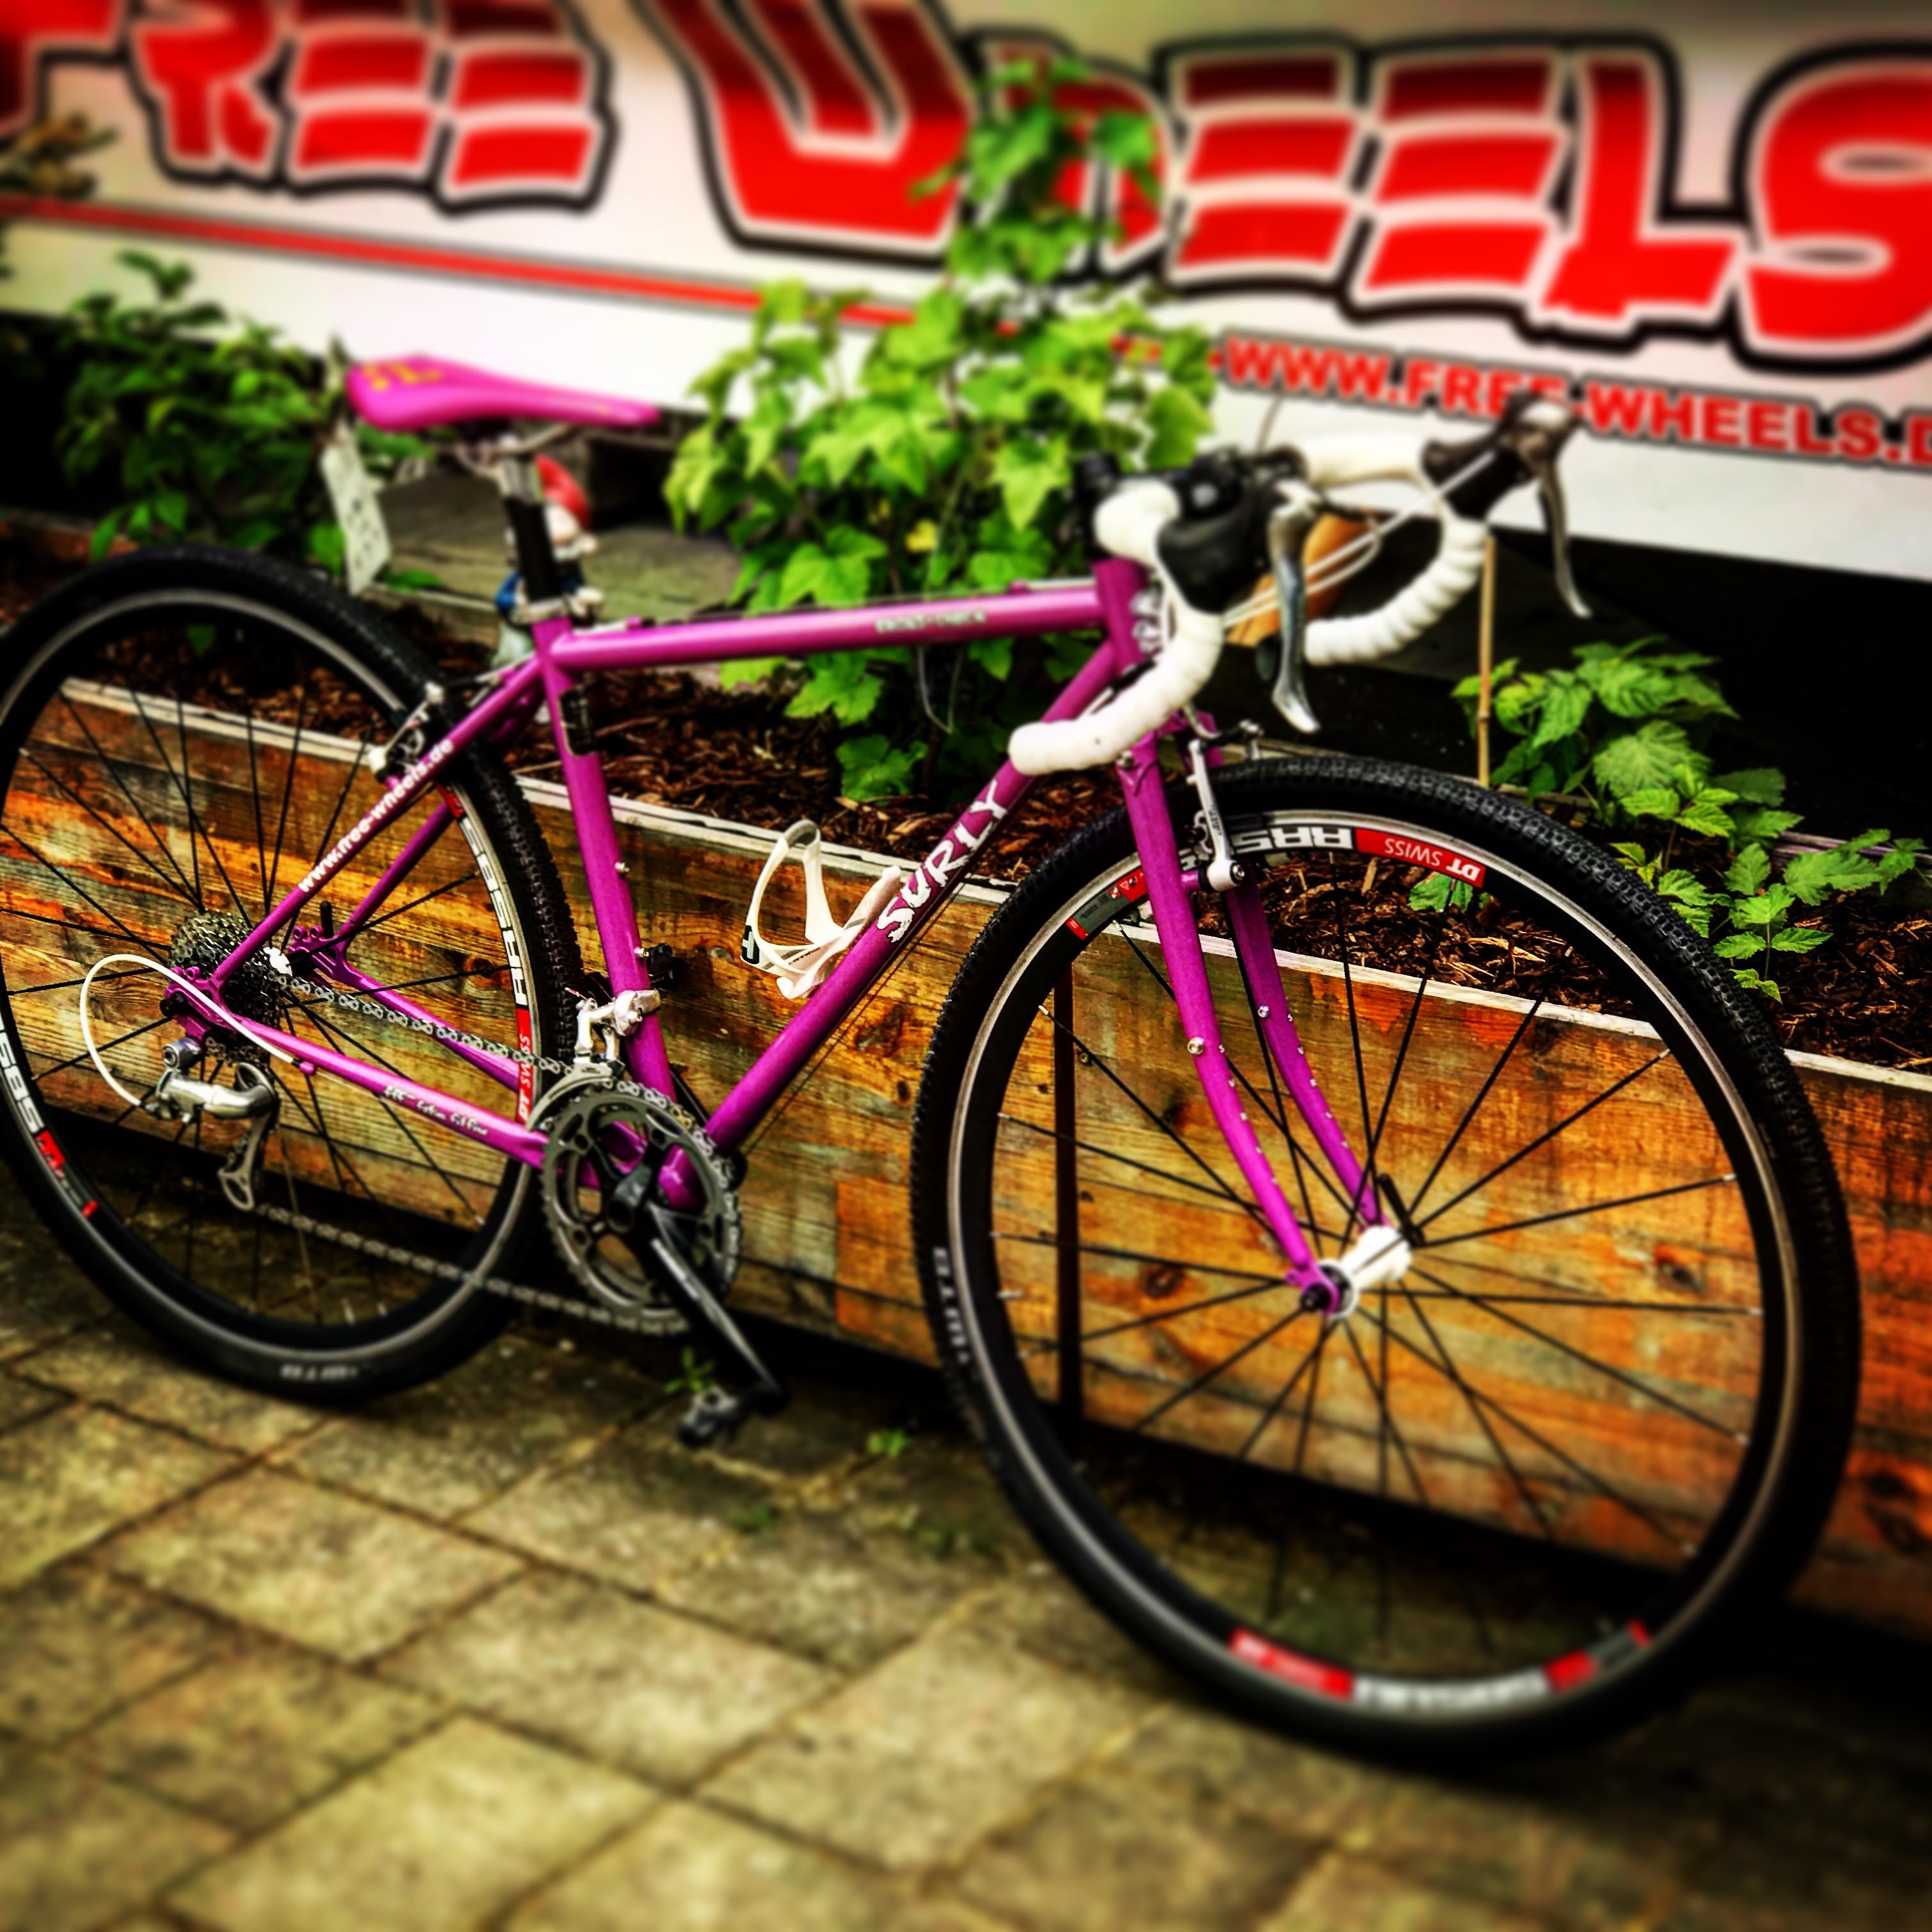 Free Wheels - Gravel - Style